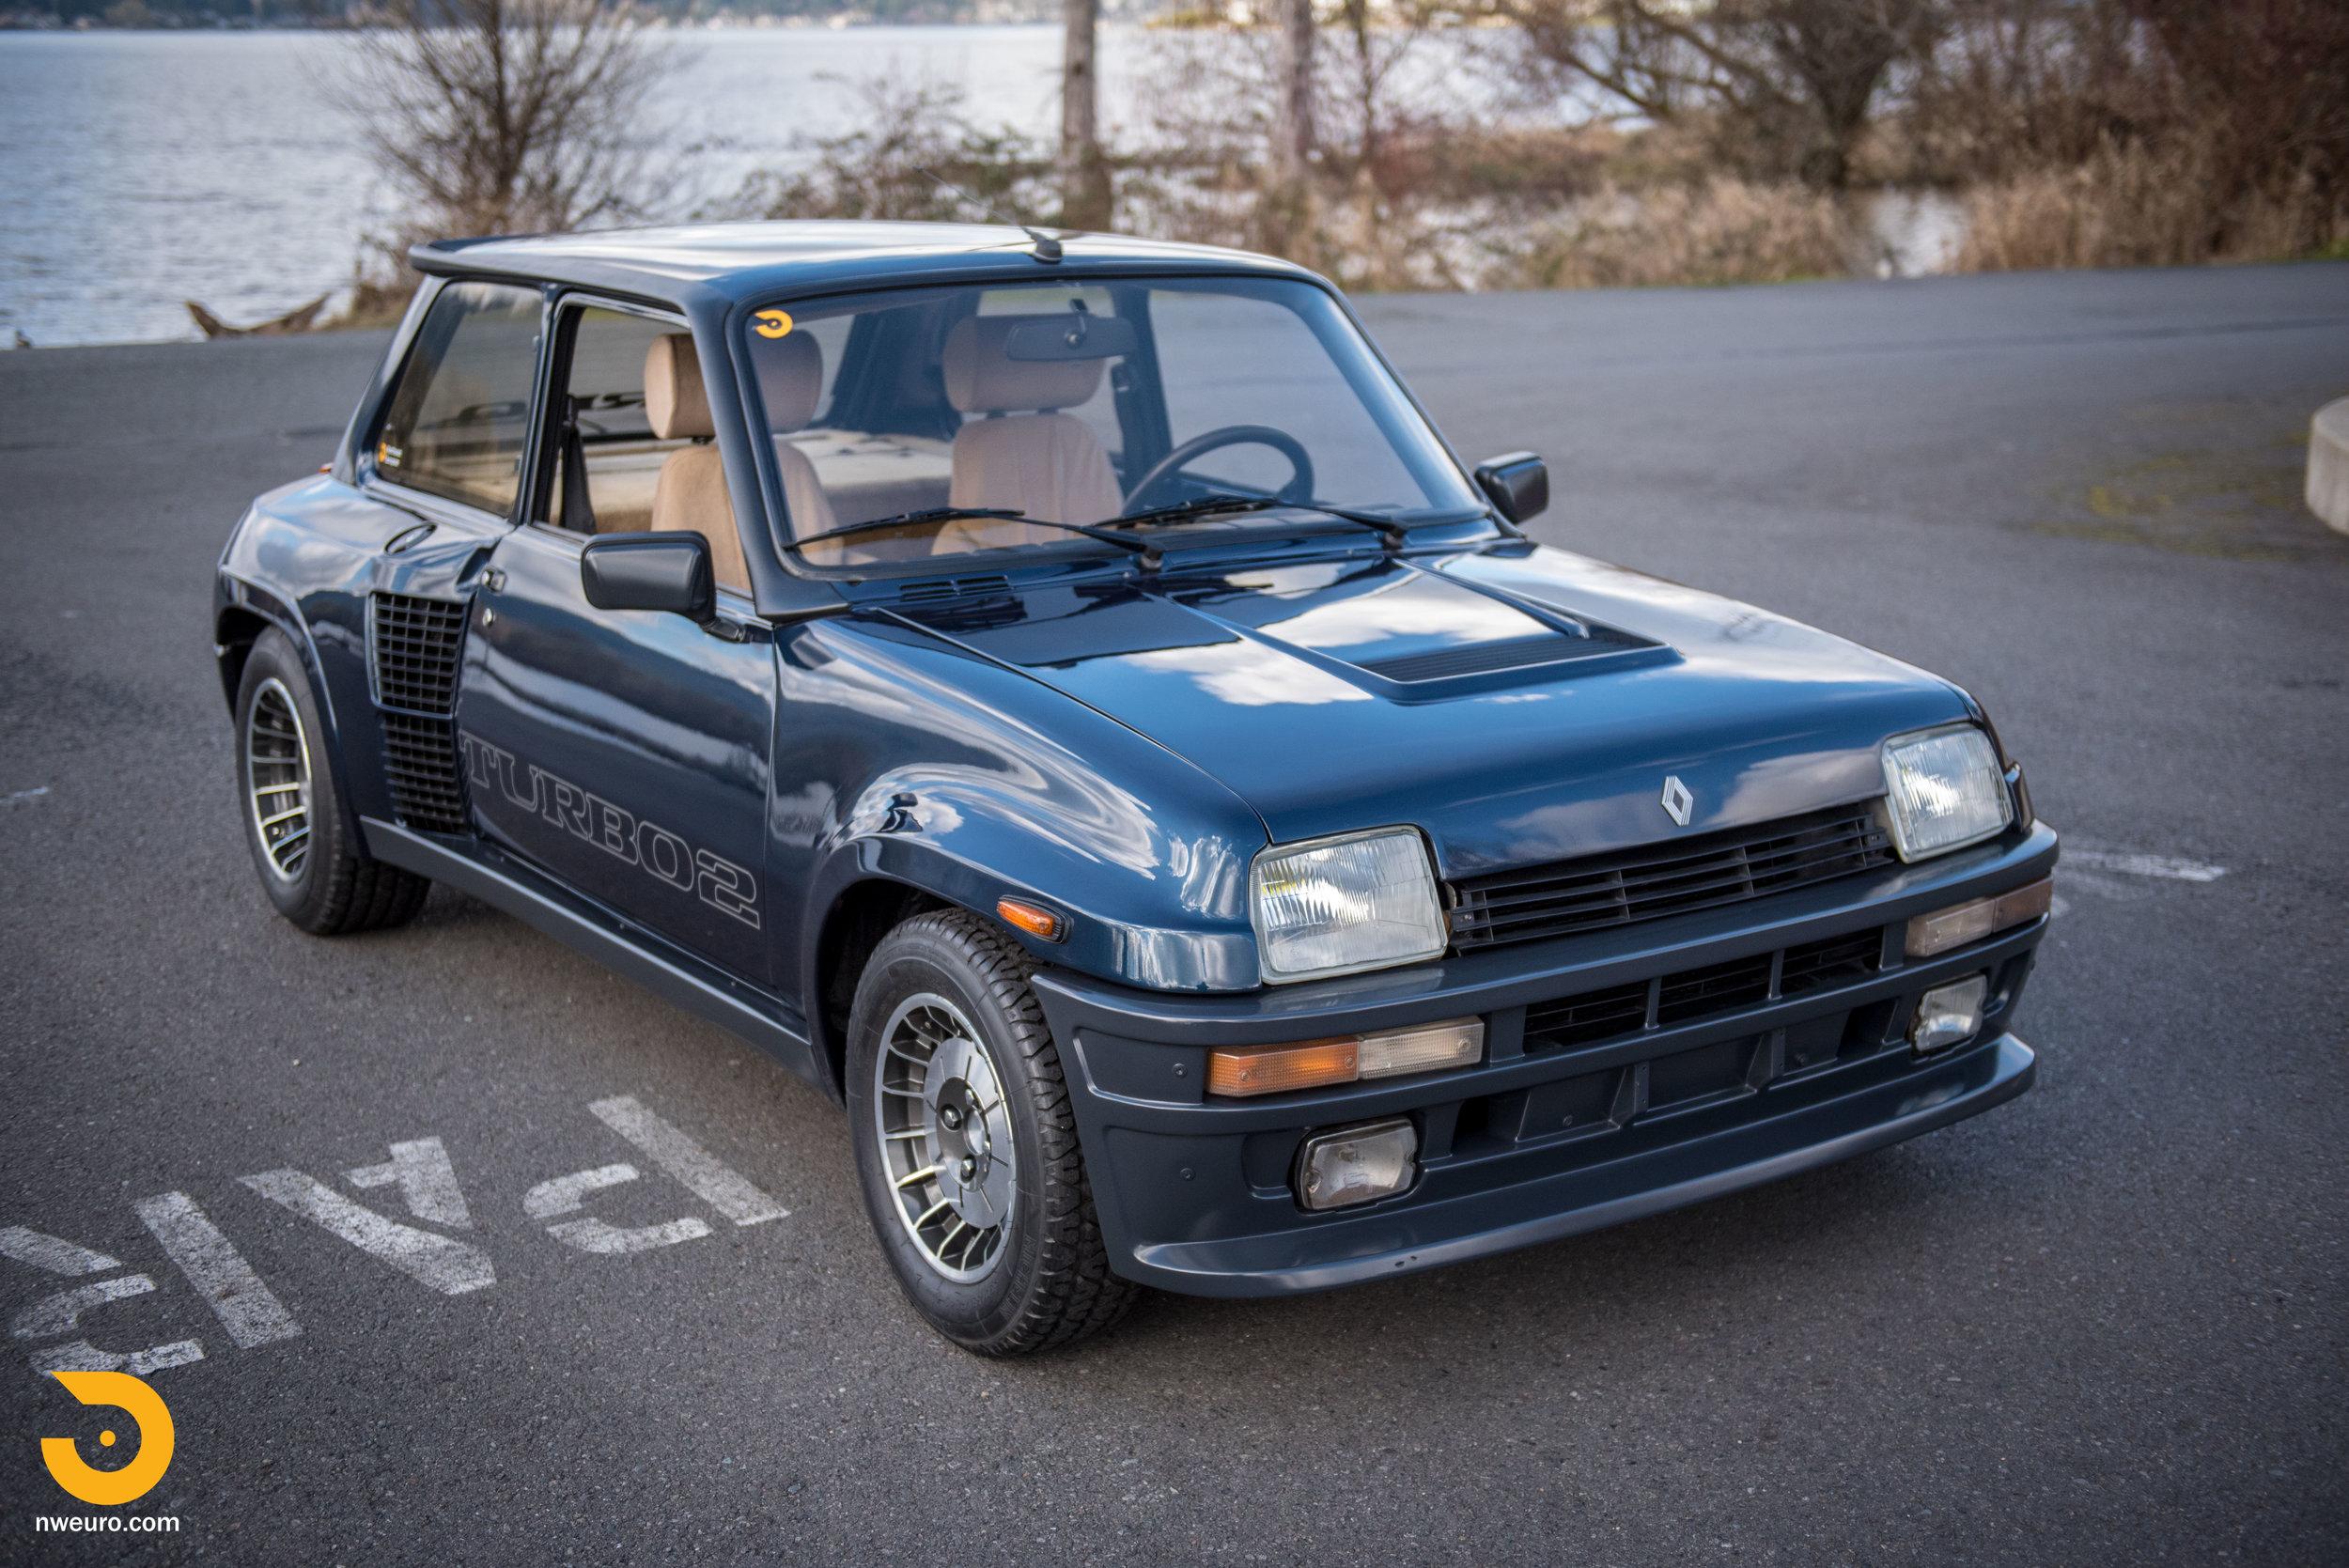 1983 Renault R5 Turbo 2-29.jpg